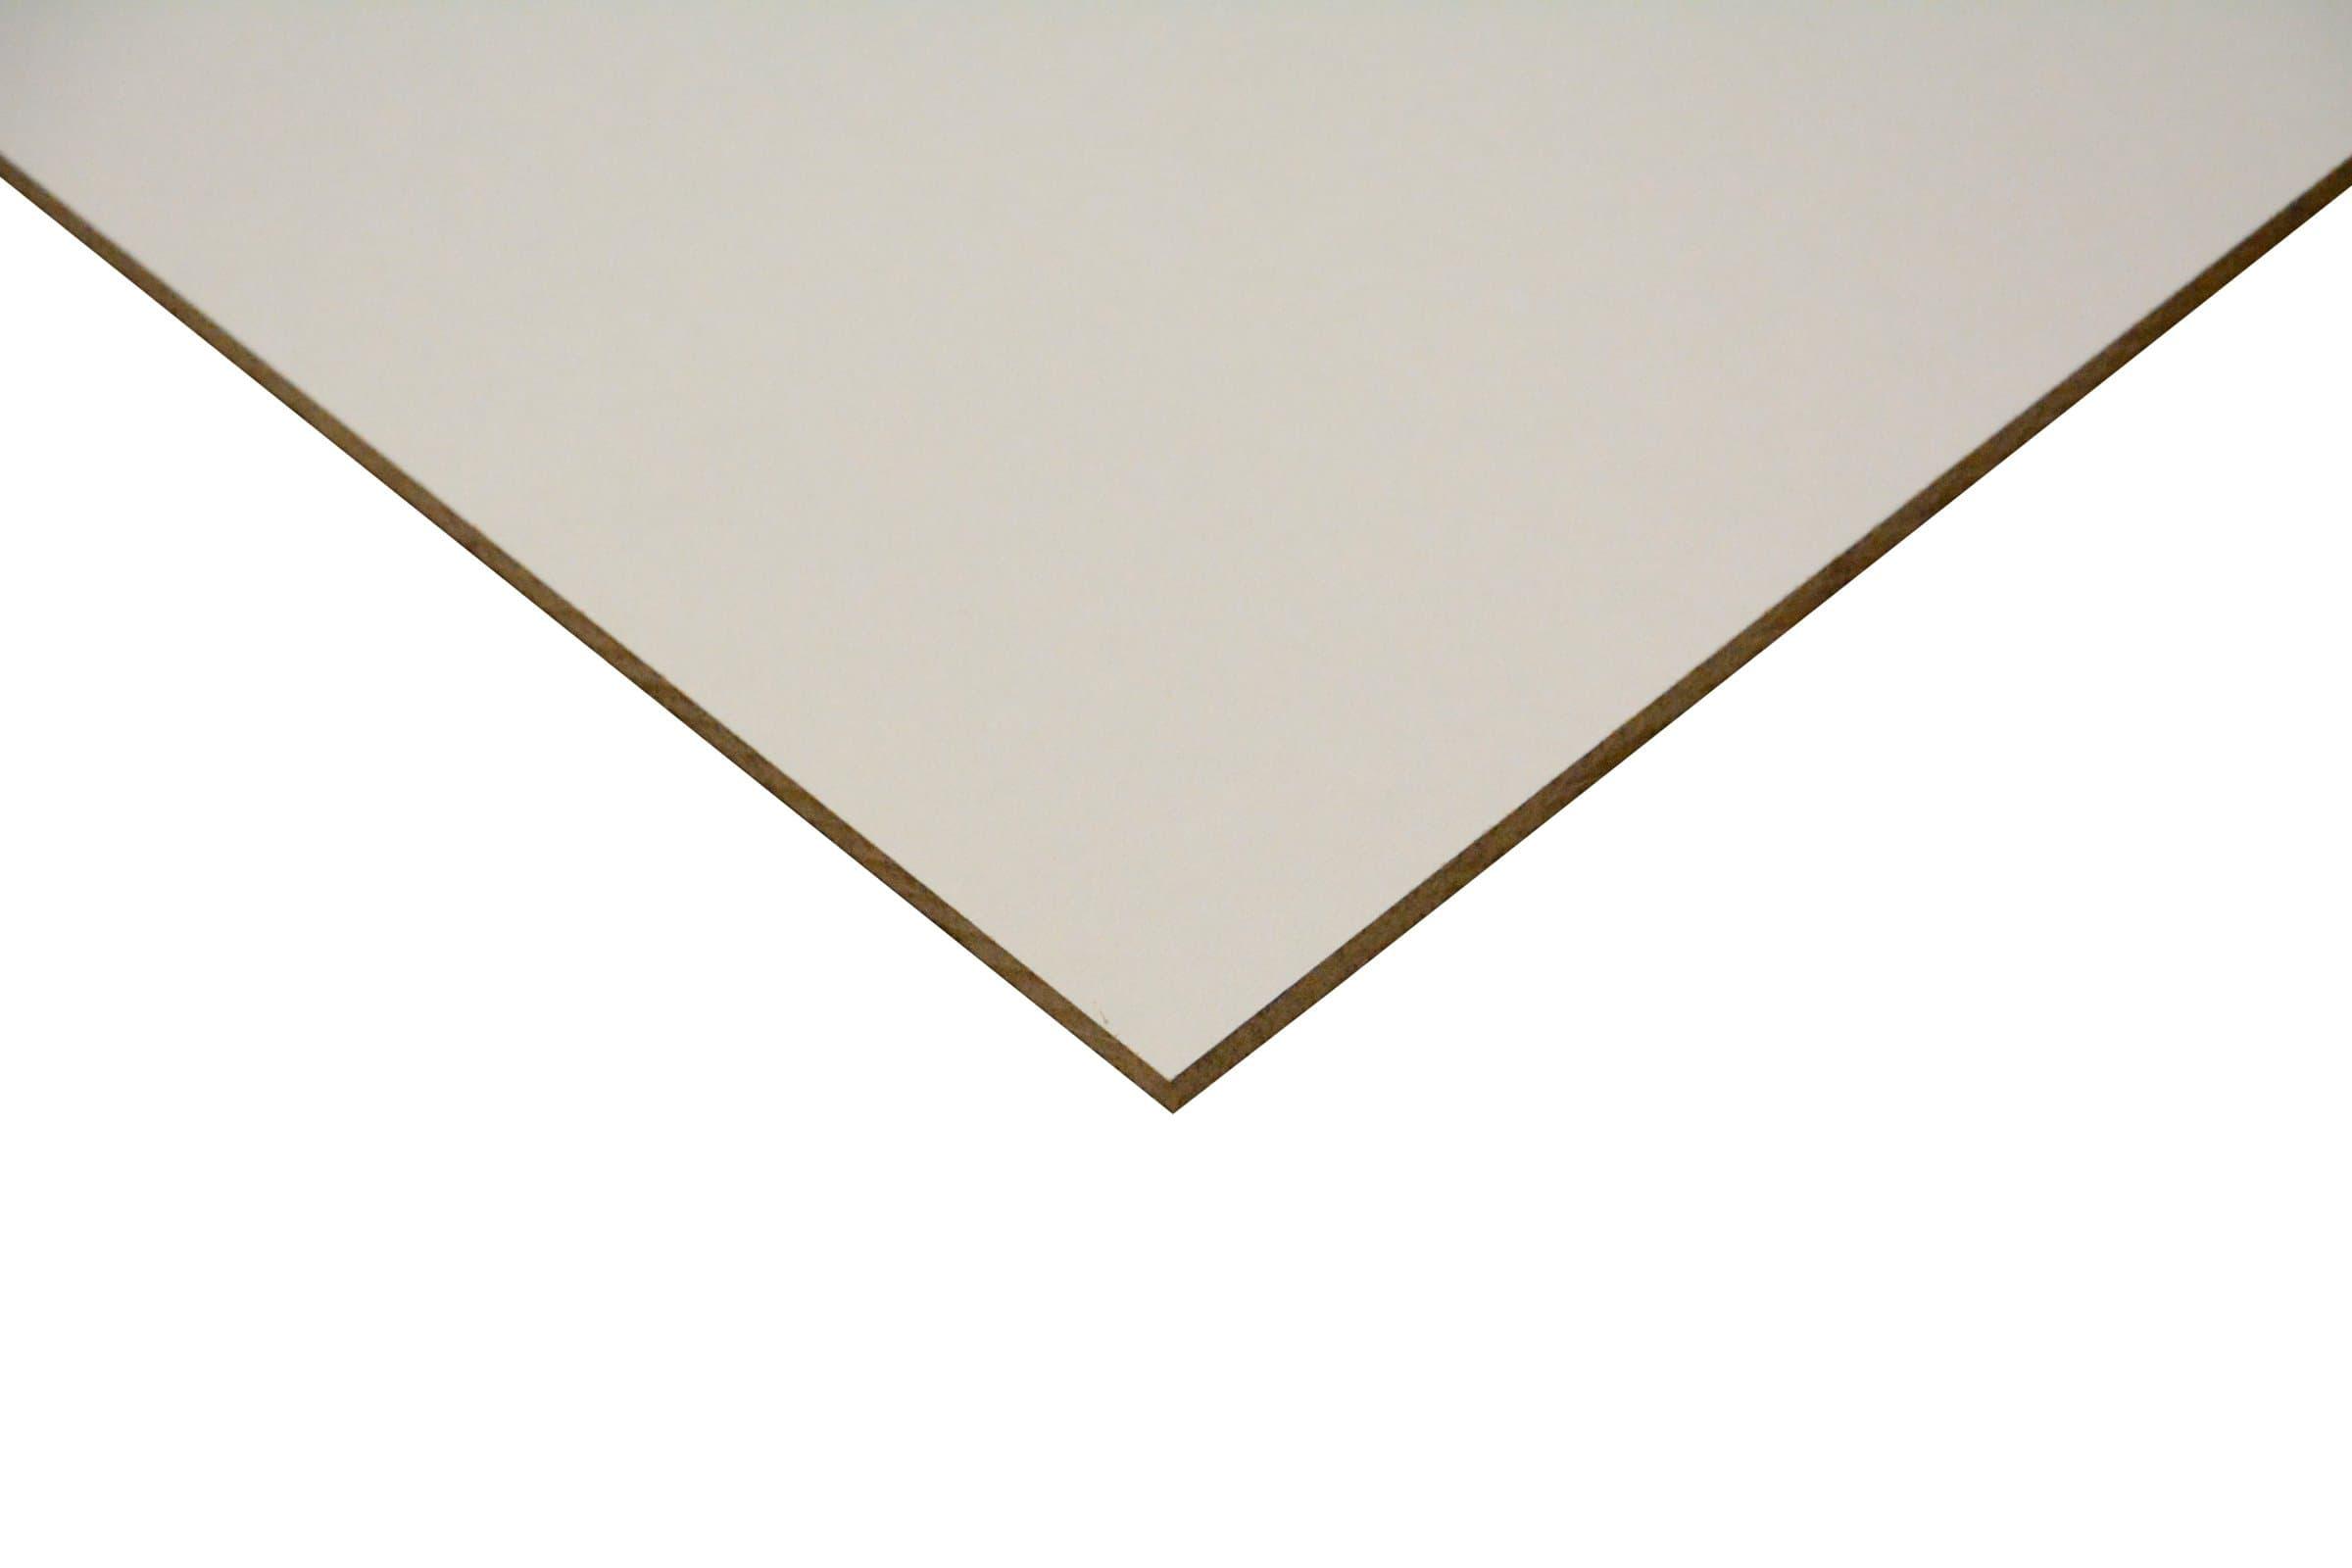 panneau mdf lack line 1 face blanc migros. Black Bedroom Furniture Sets. Home Design Ideas